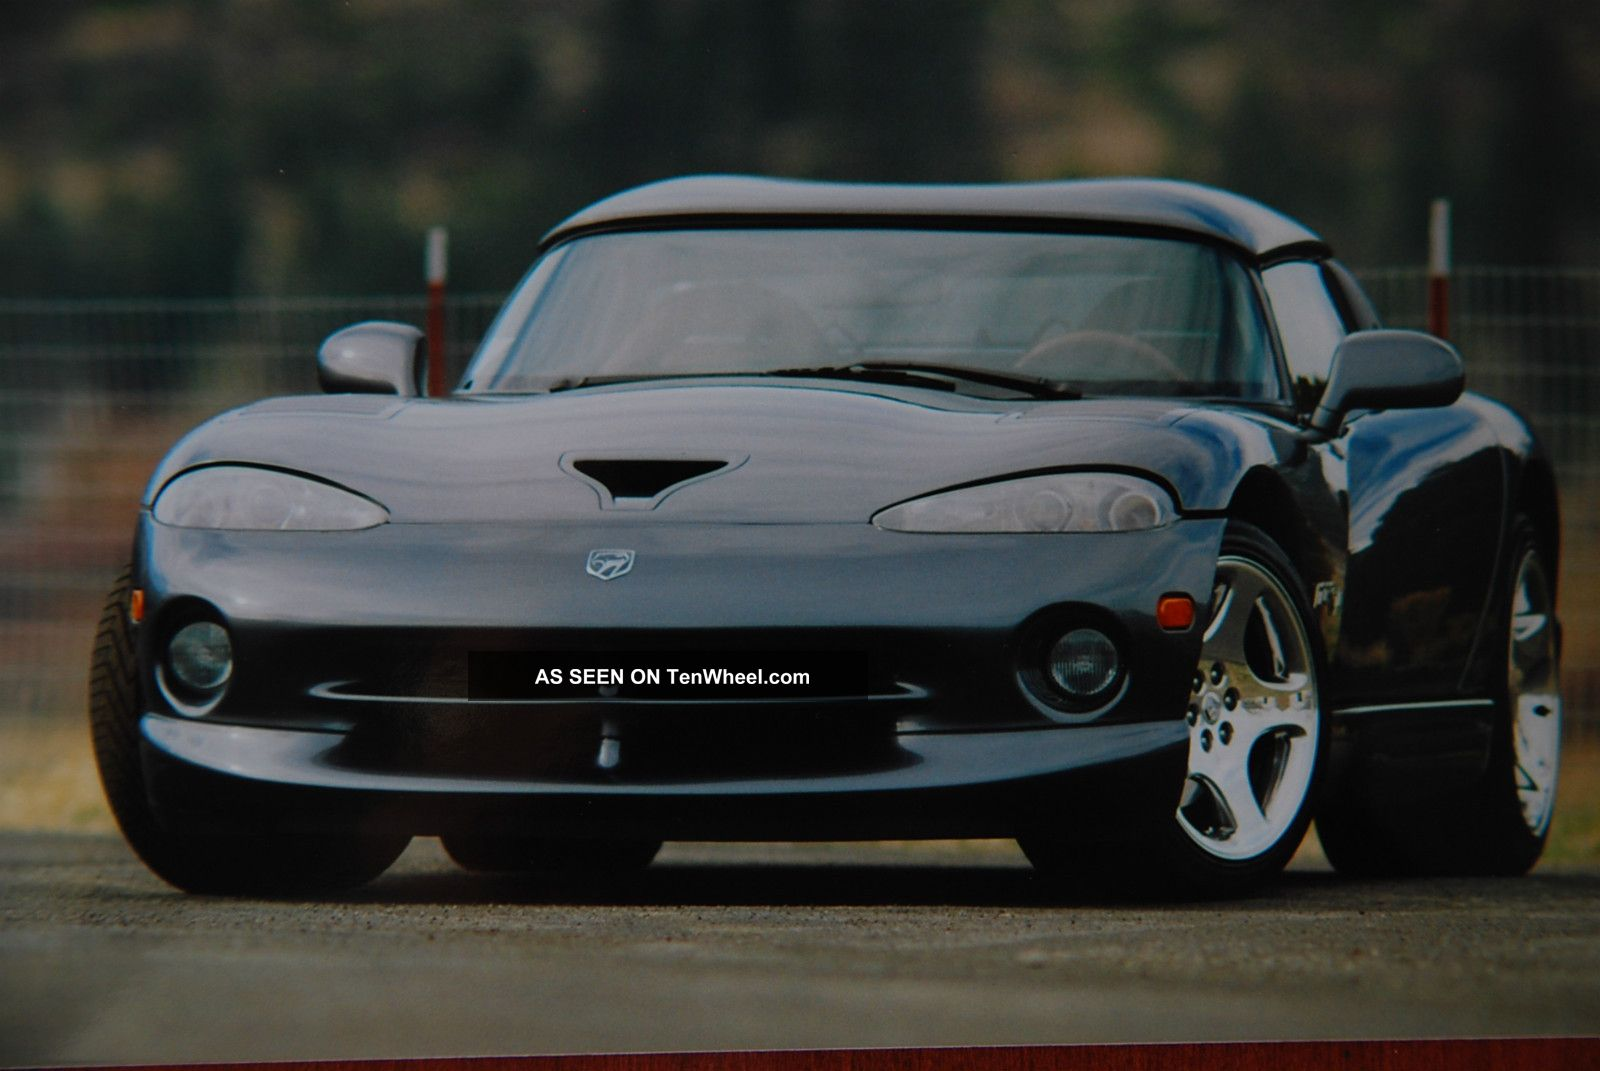 2000 Dodge Viper Rt10 Sharp Lo Mi American Muscle Rt 10 Viper photo